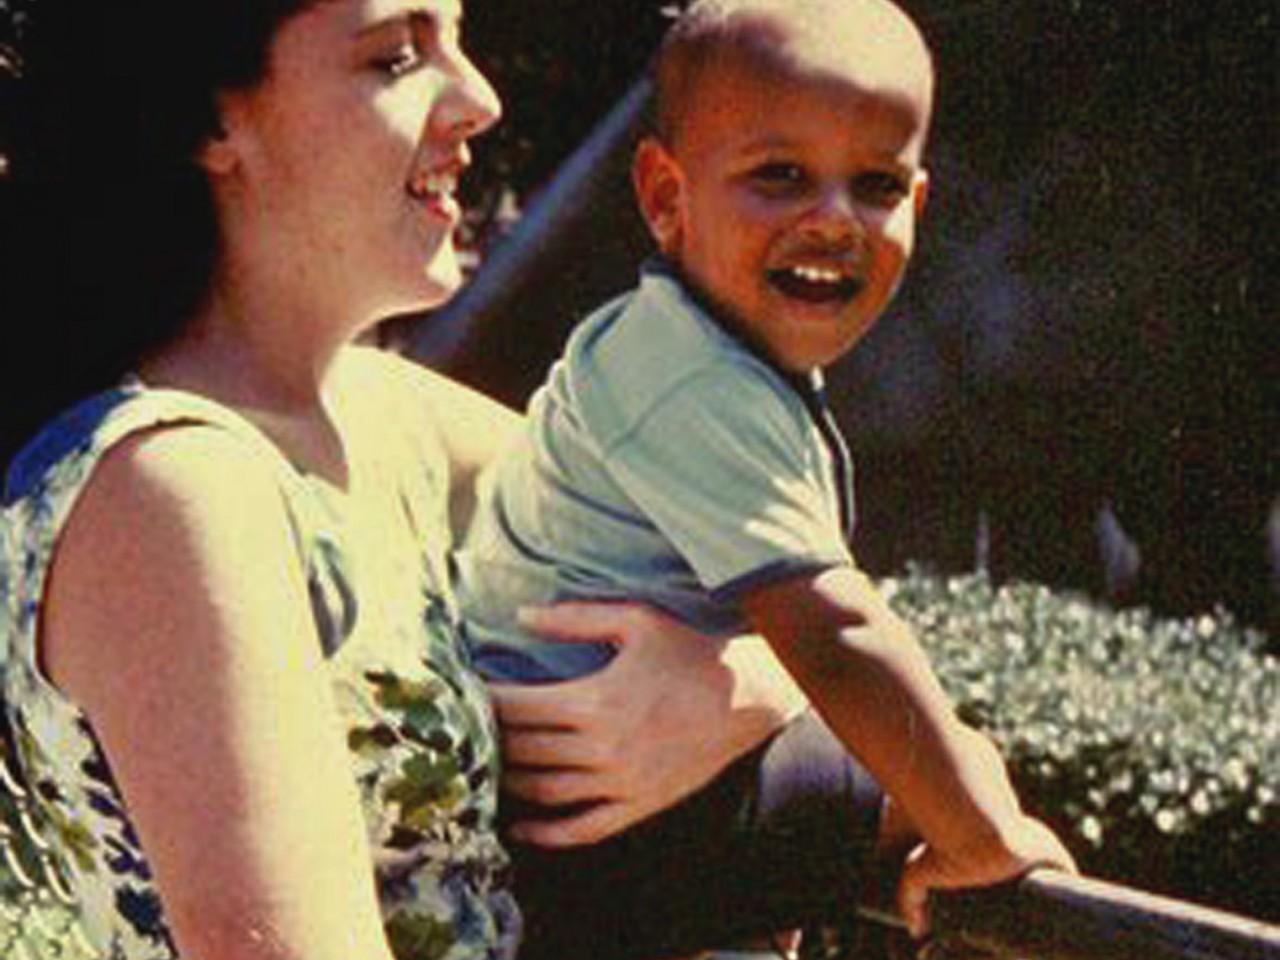 barack_obamas_mother_the_girl_who_ran_away-1280x960